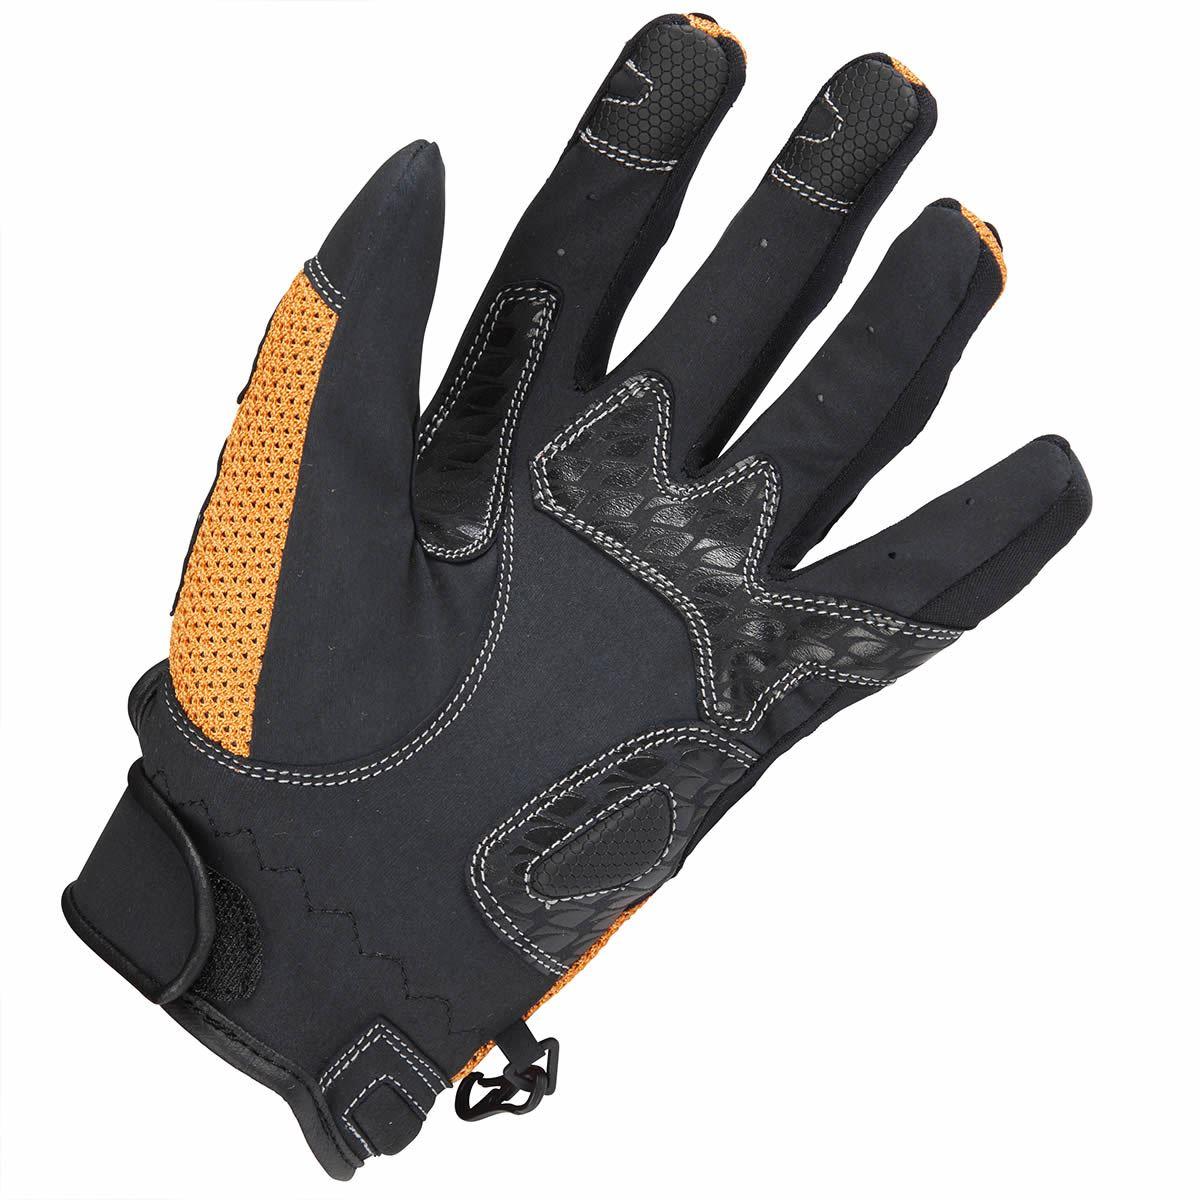 Spada-Mx-Air-Cuir-amp-Textile-Gants-Moto-Noir-Orange-Touring-Blinde miniature 10